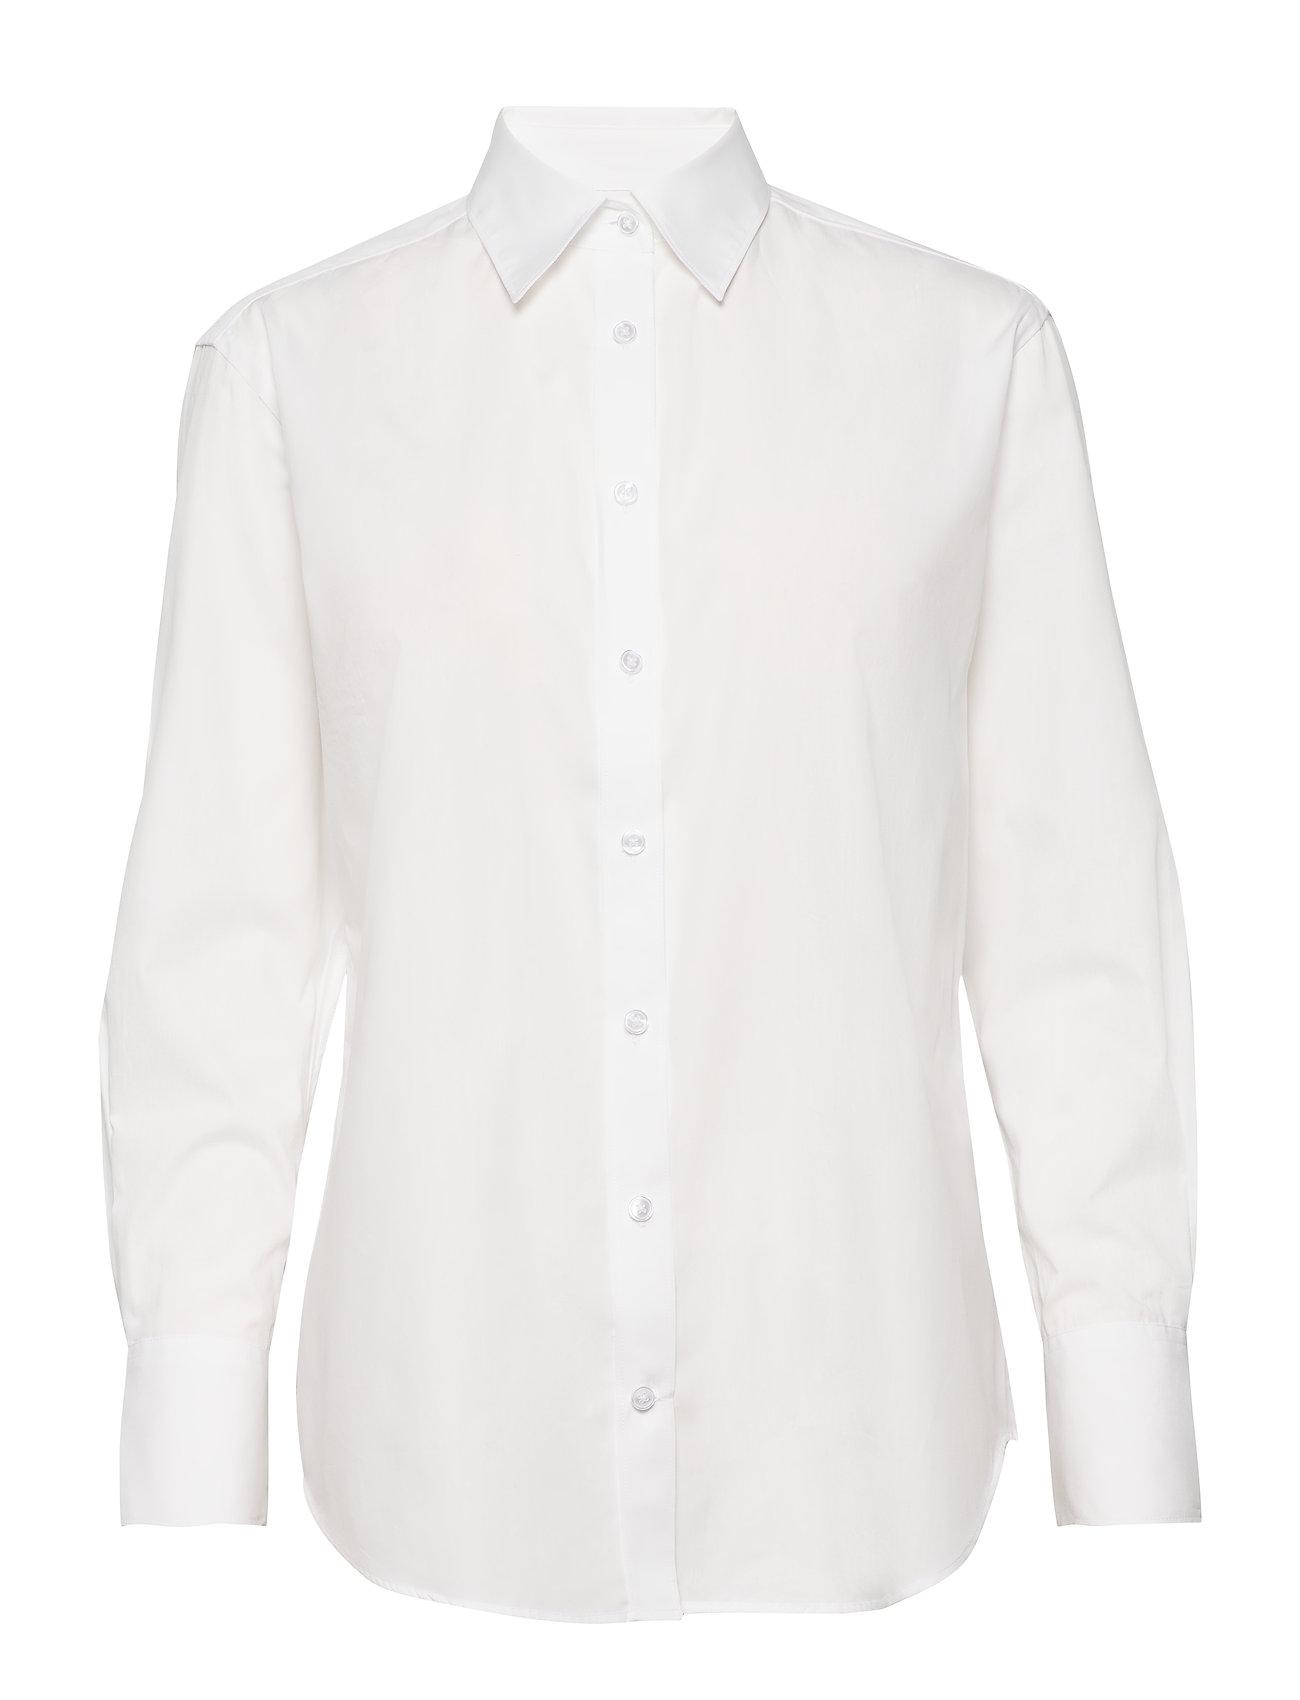 SAND - 8704 - Nube - overhemden met lange mouwen - optical white - 0